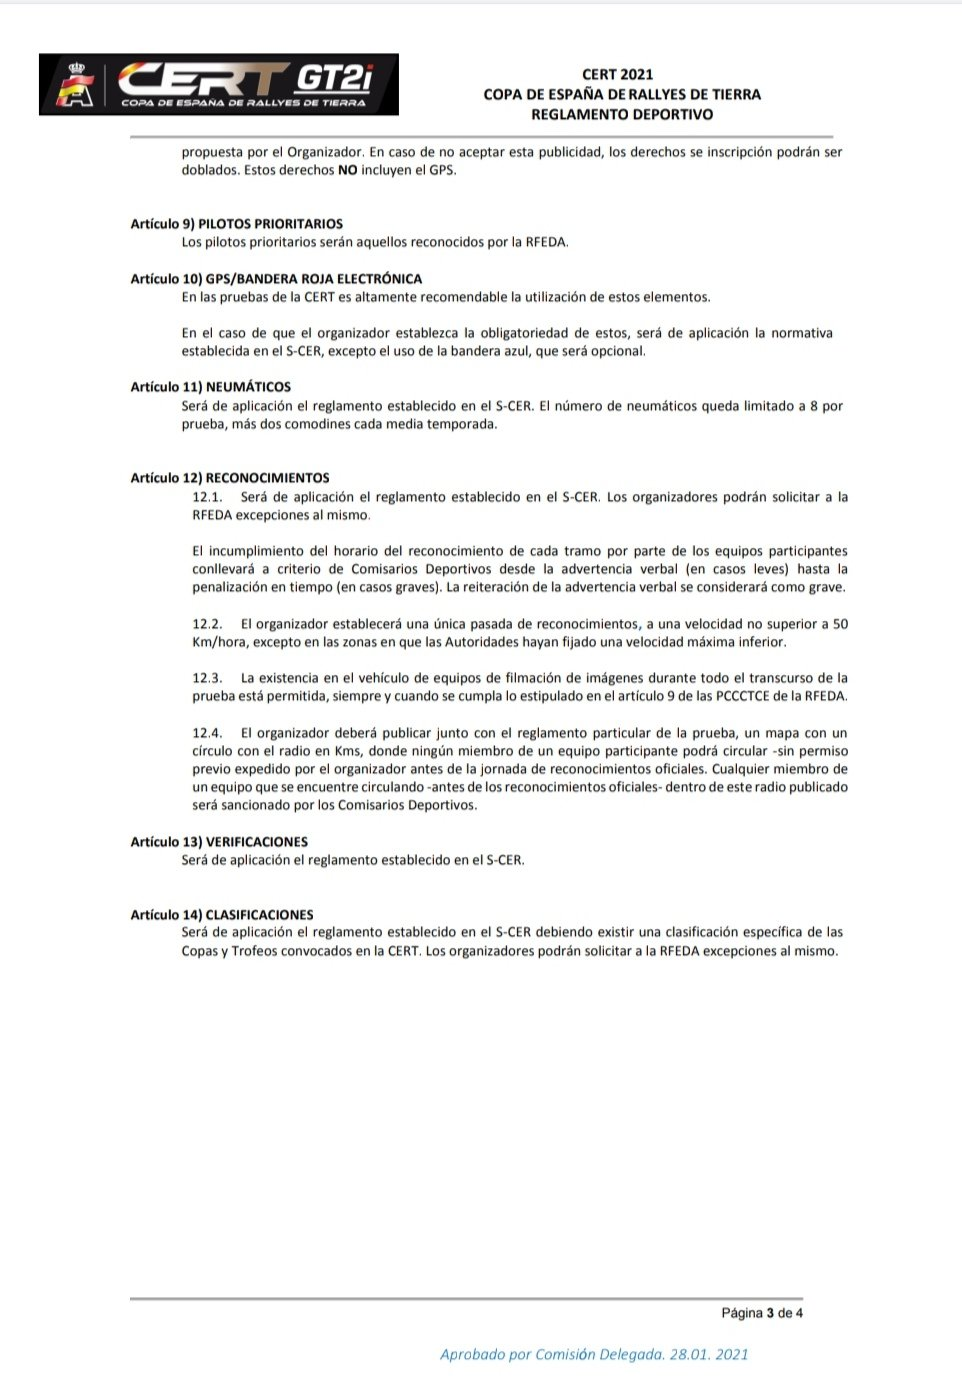 Noticias y/o rumores de temporada: Temporada 2021 - Página 6 Eu2-1koU4AYSbSi?format=jpg&name=large